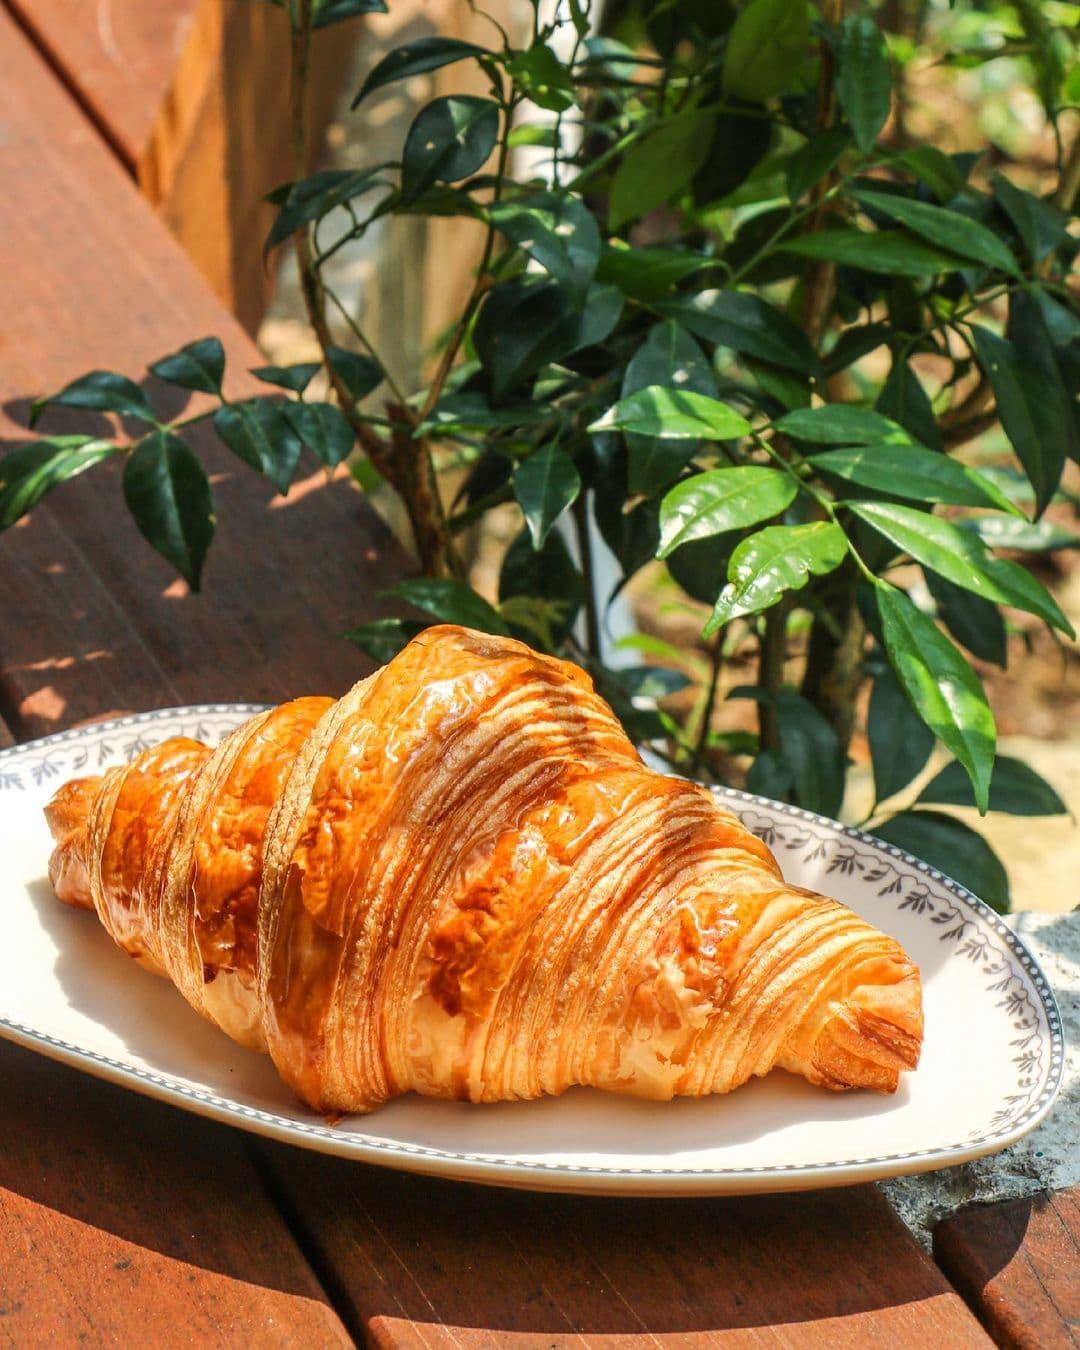 tiong bahru bakery - signature croissant